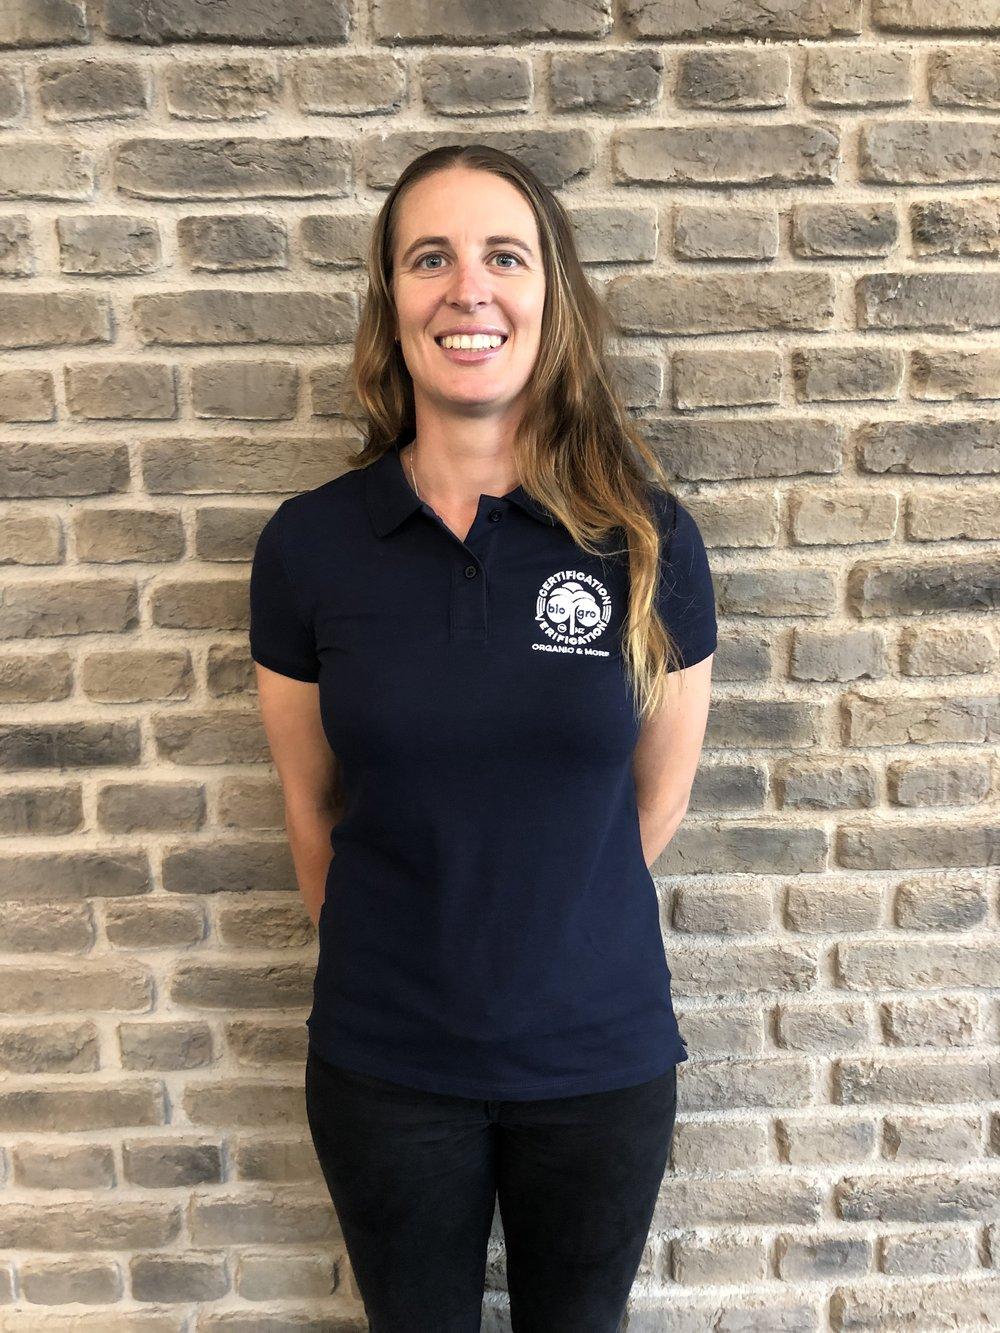 Nicole Atkinson, Certification Officer